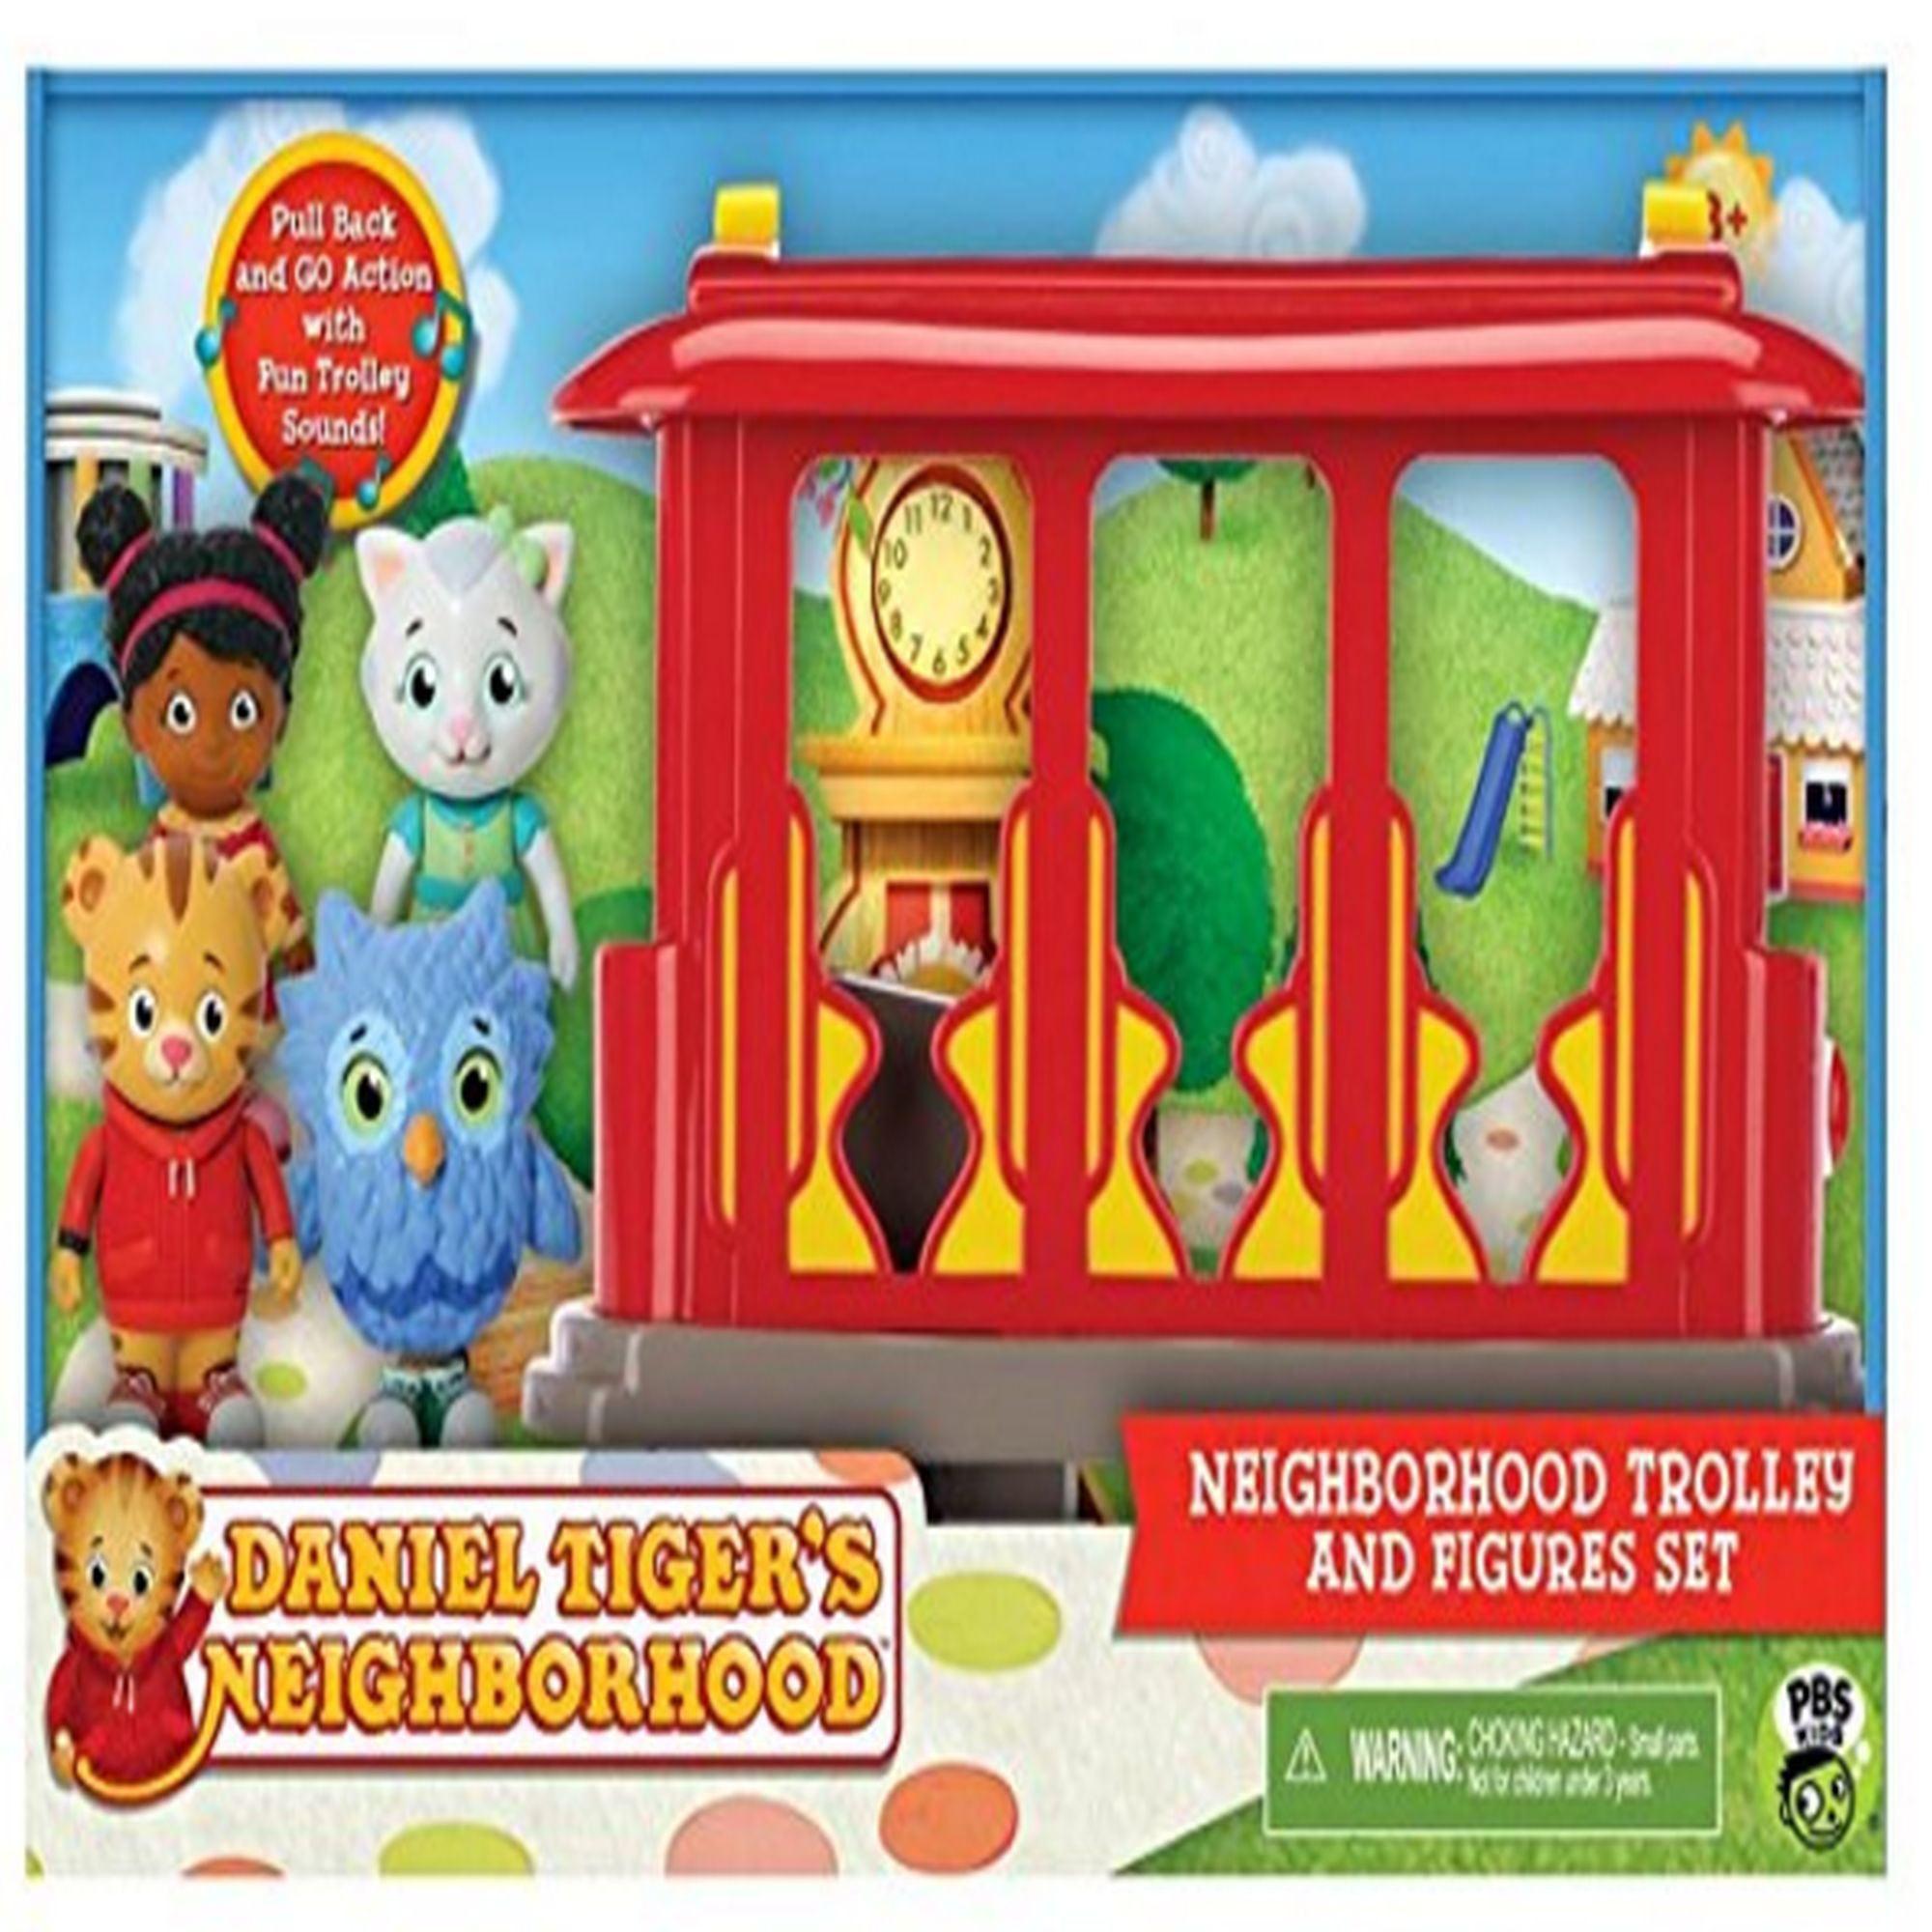 Daniel Tigers Neighborhood Trolley and Figures Set